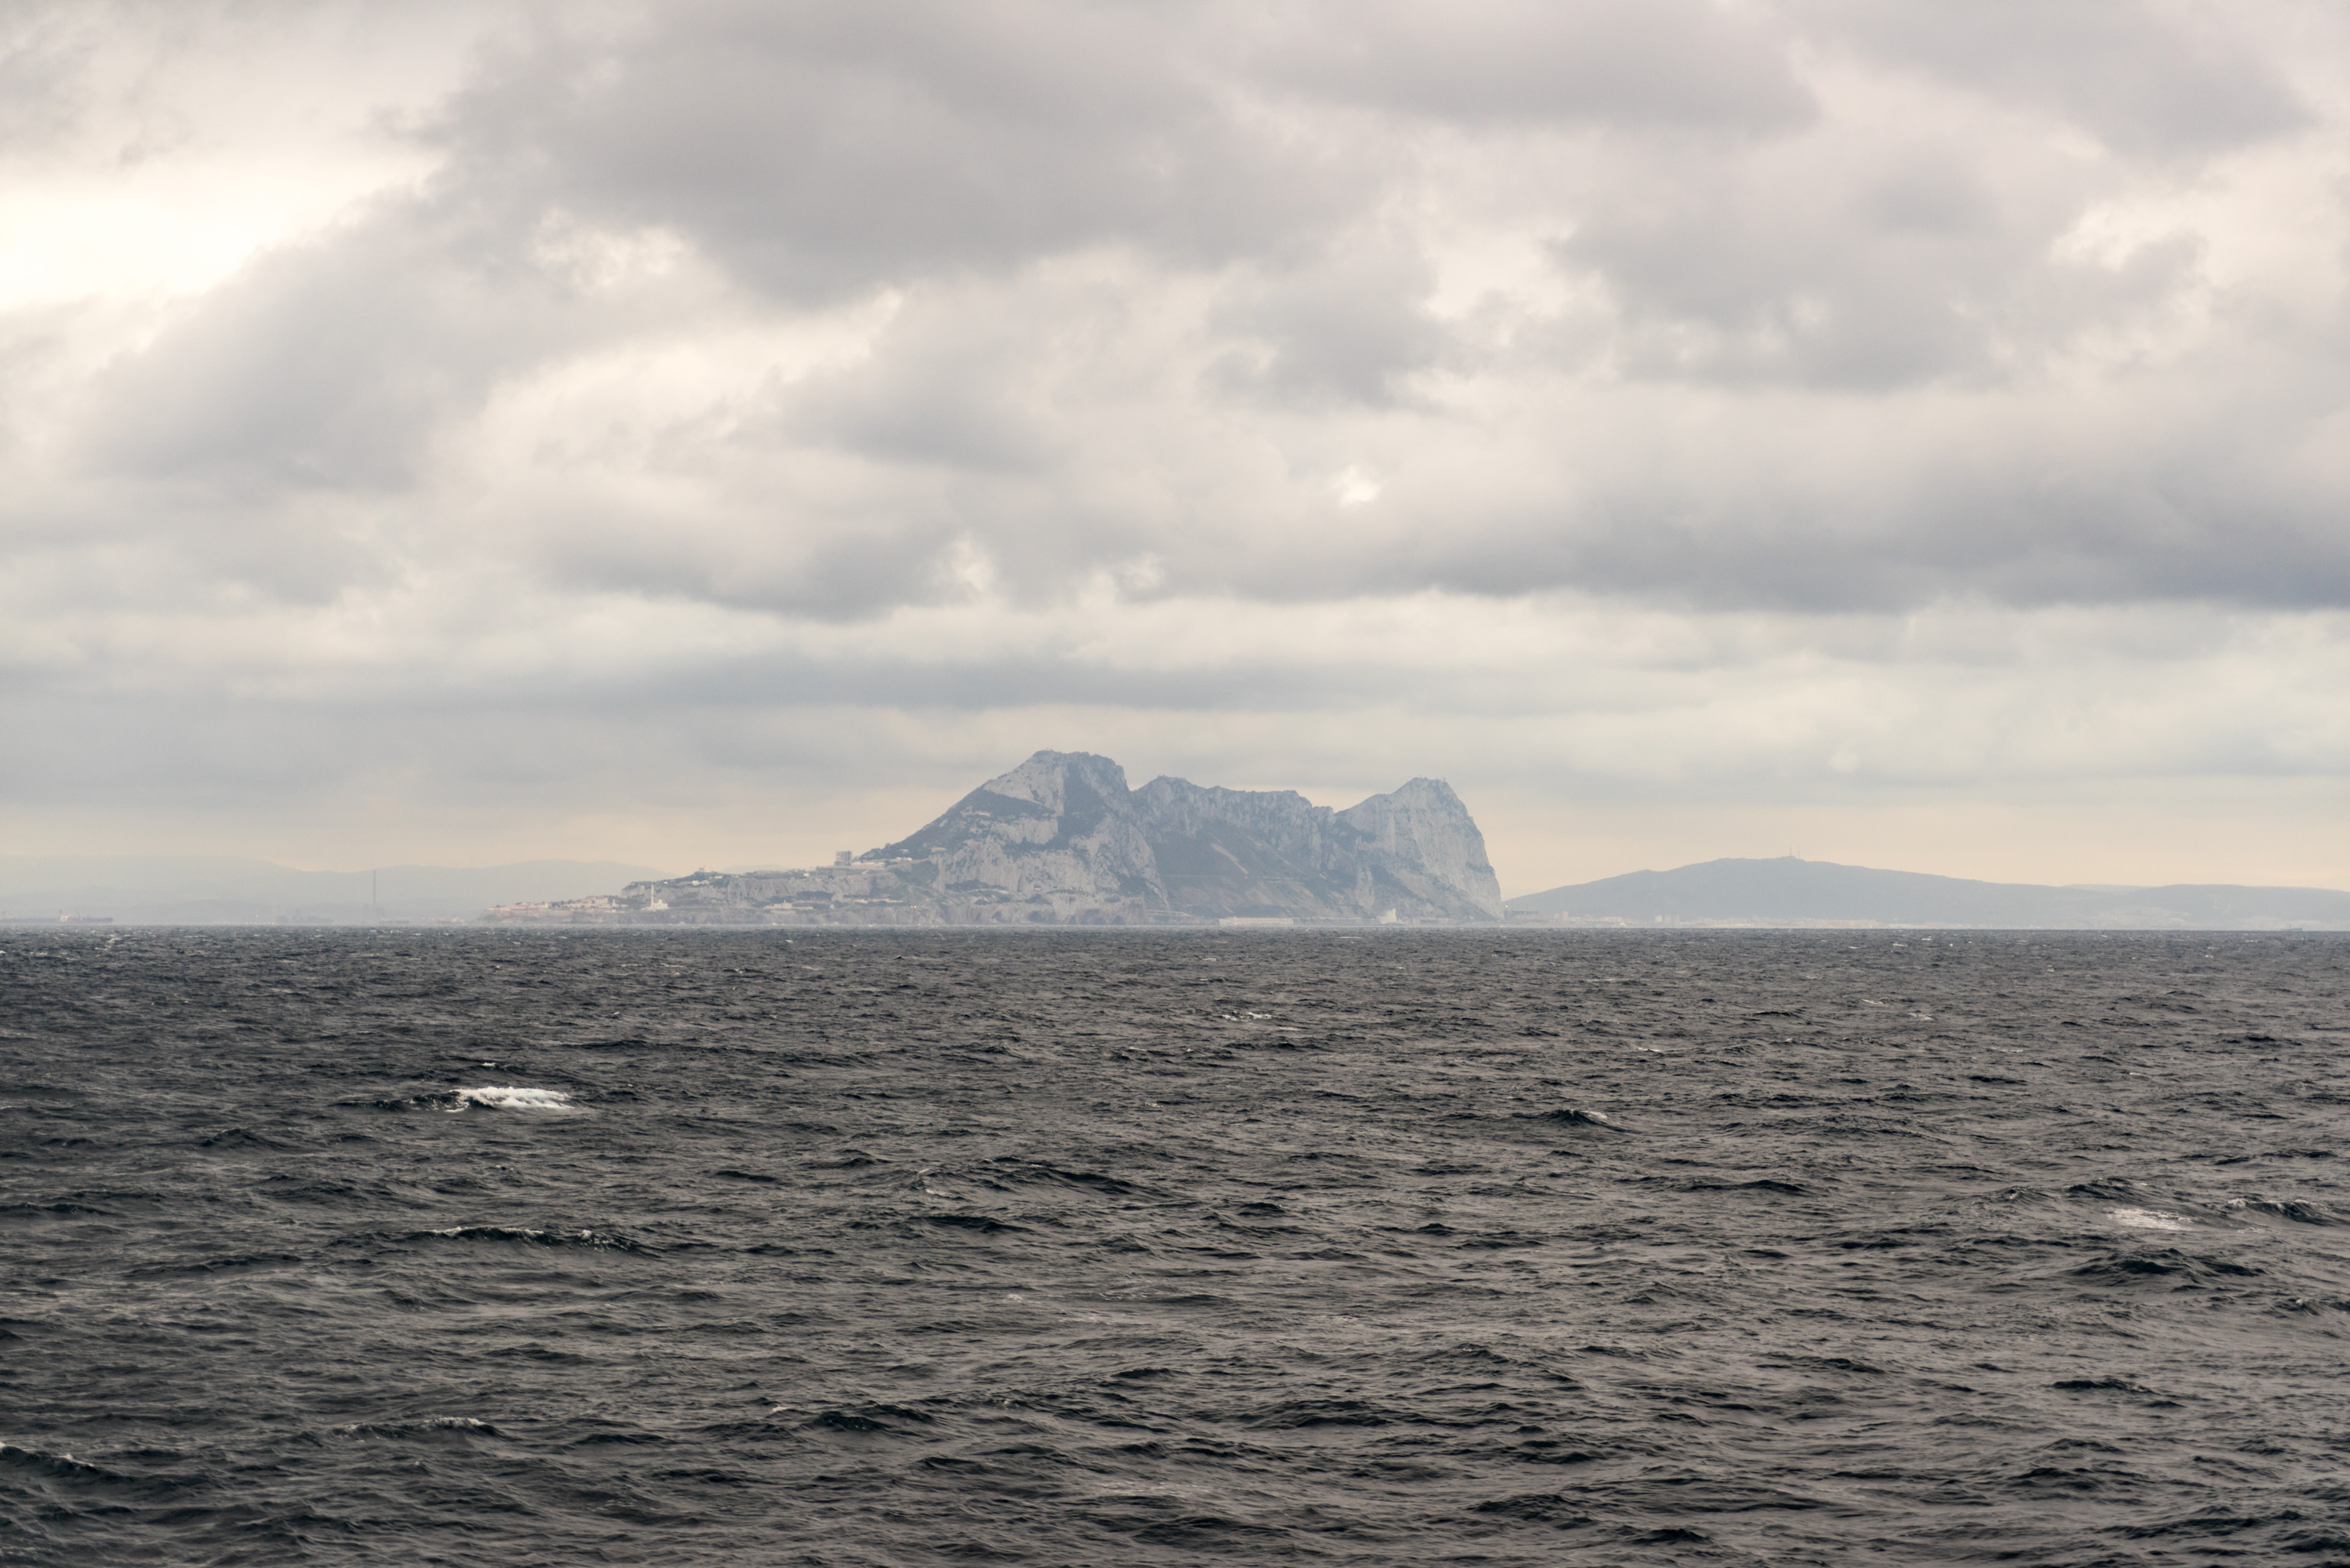 Transit: Mittelmeer - Gibraltar